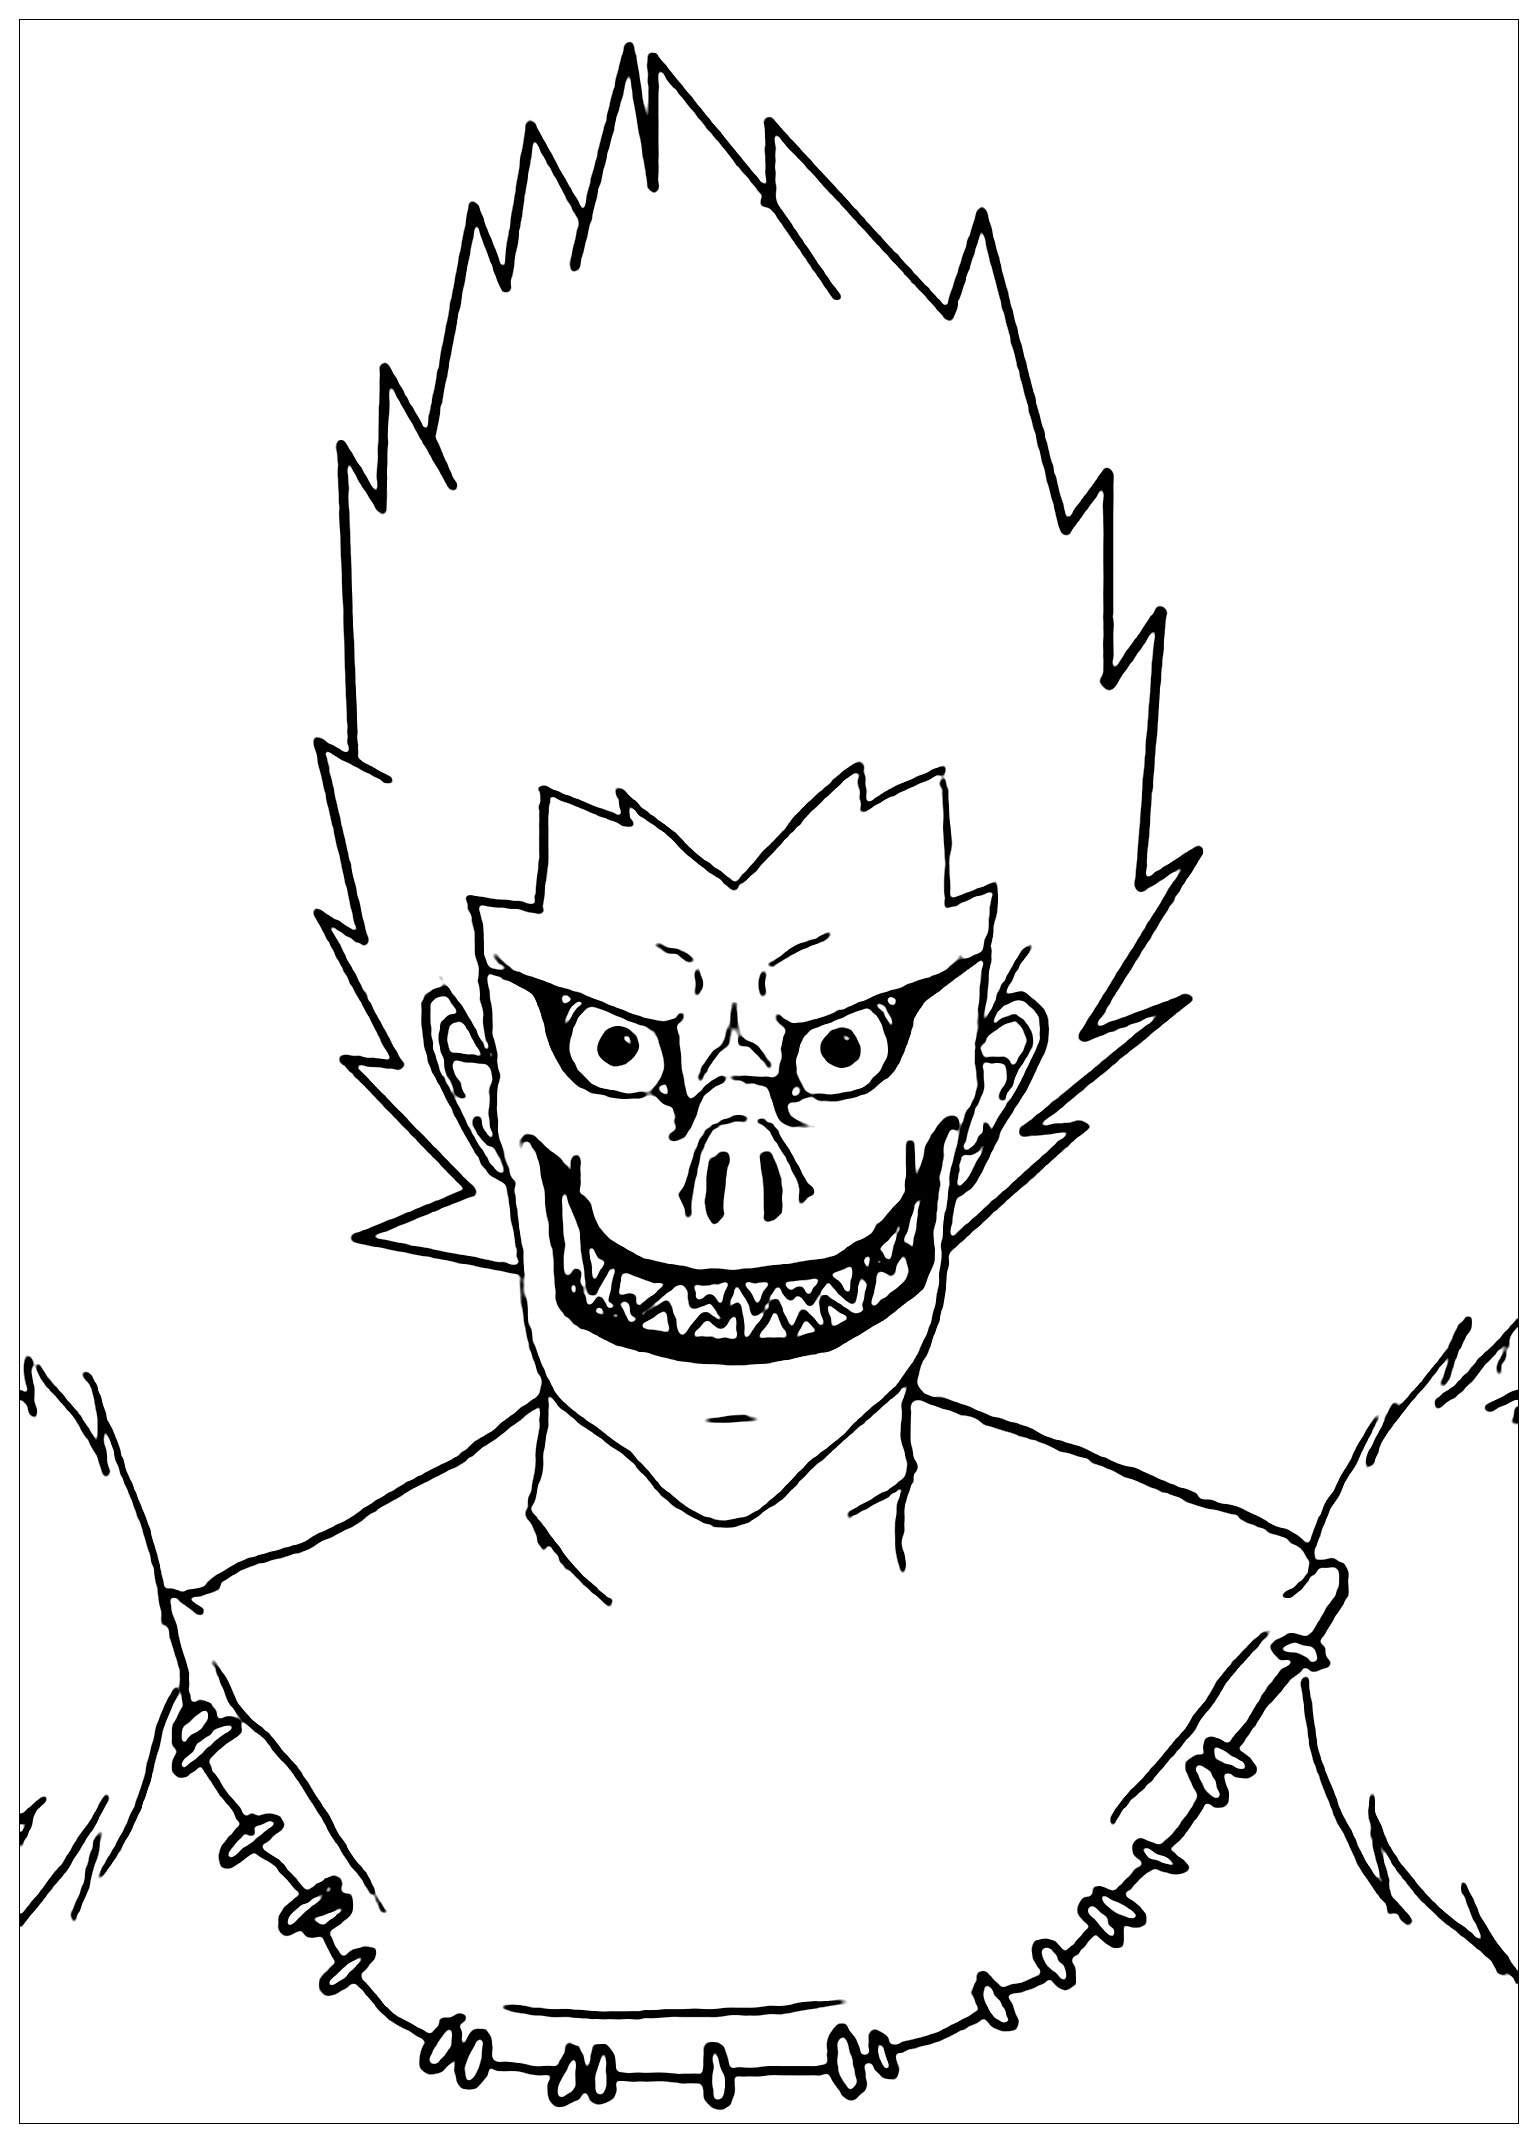 Dibujos para colorear de anime para colorear Único Amor Dibujo de Ryuk de Death Note Manga para colorear